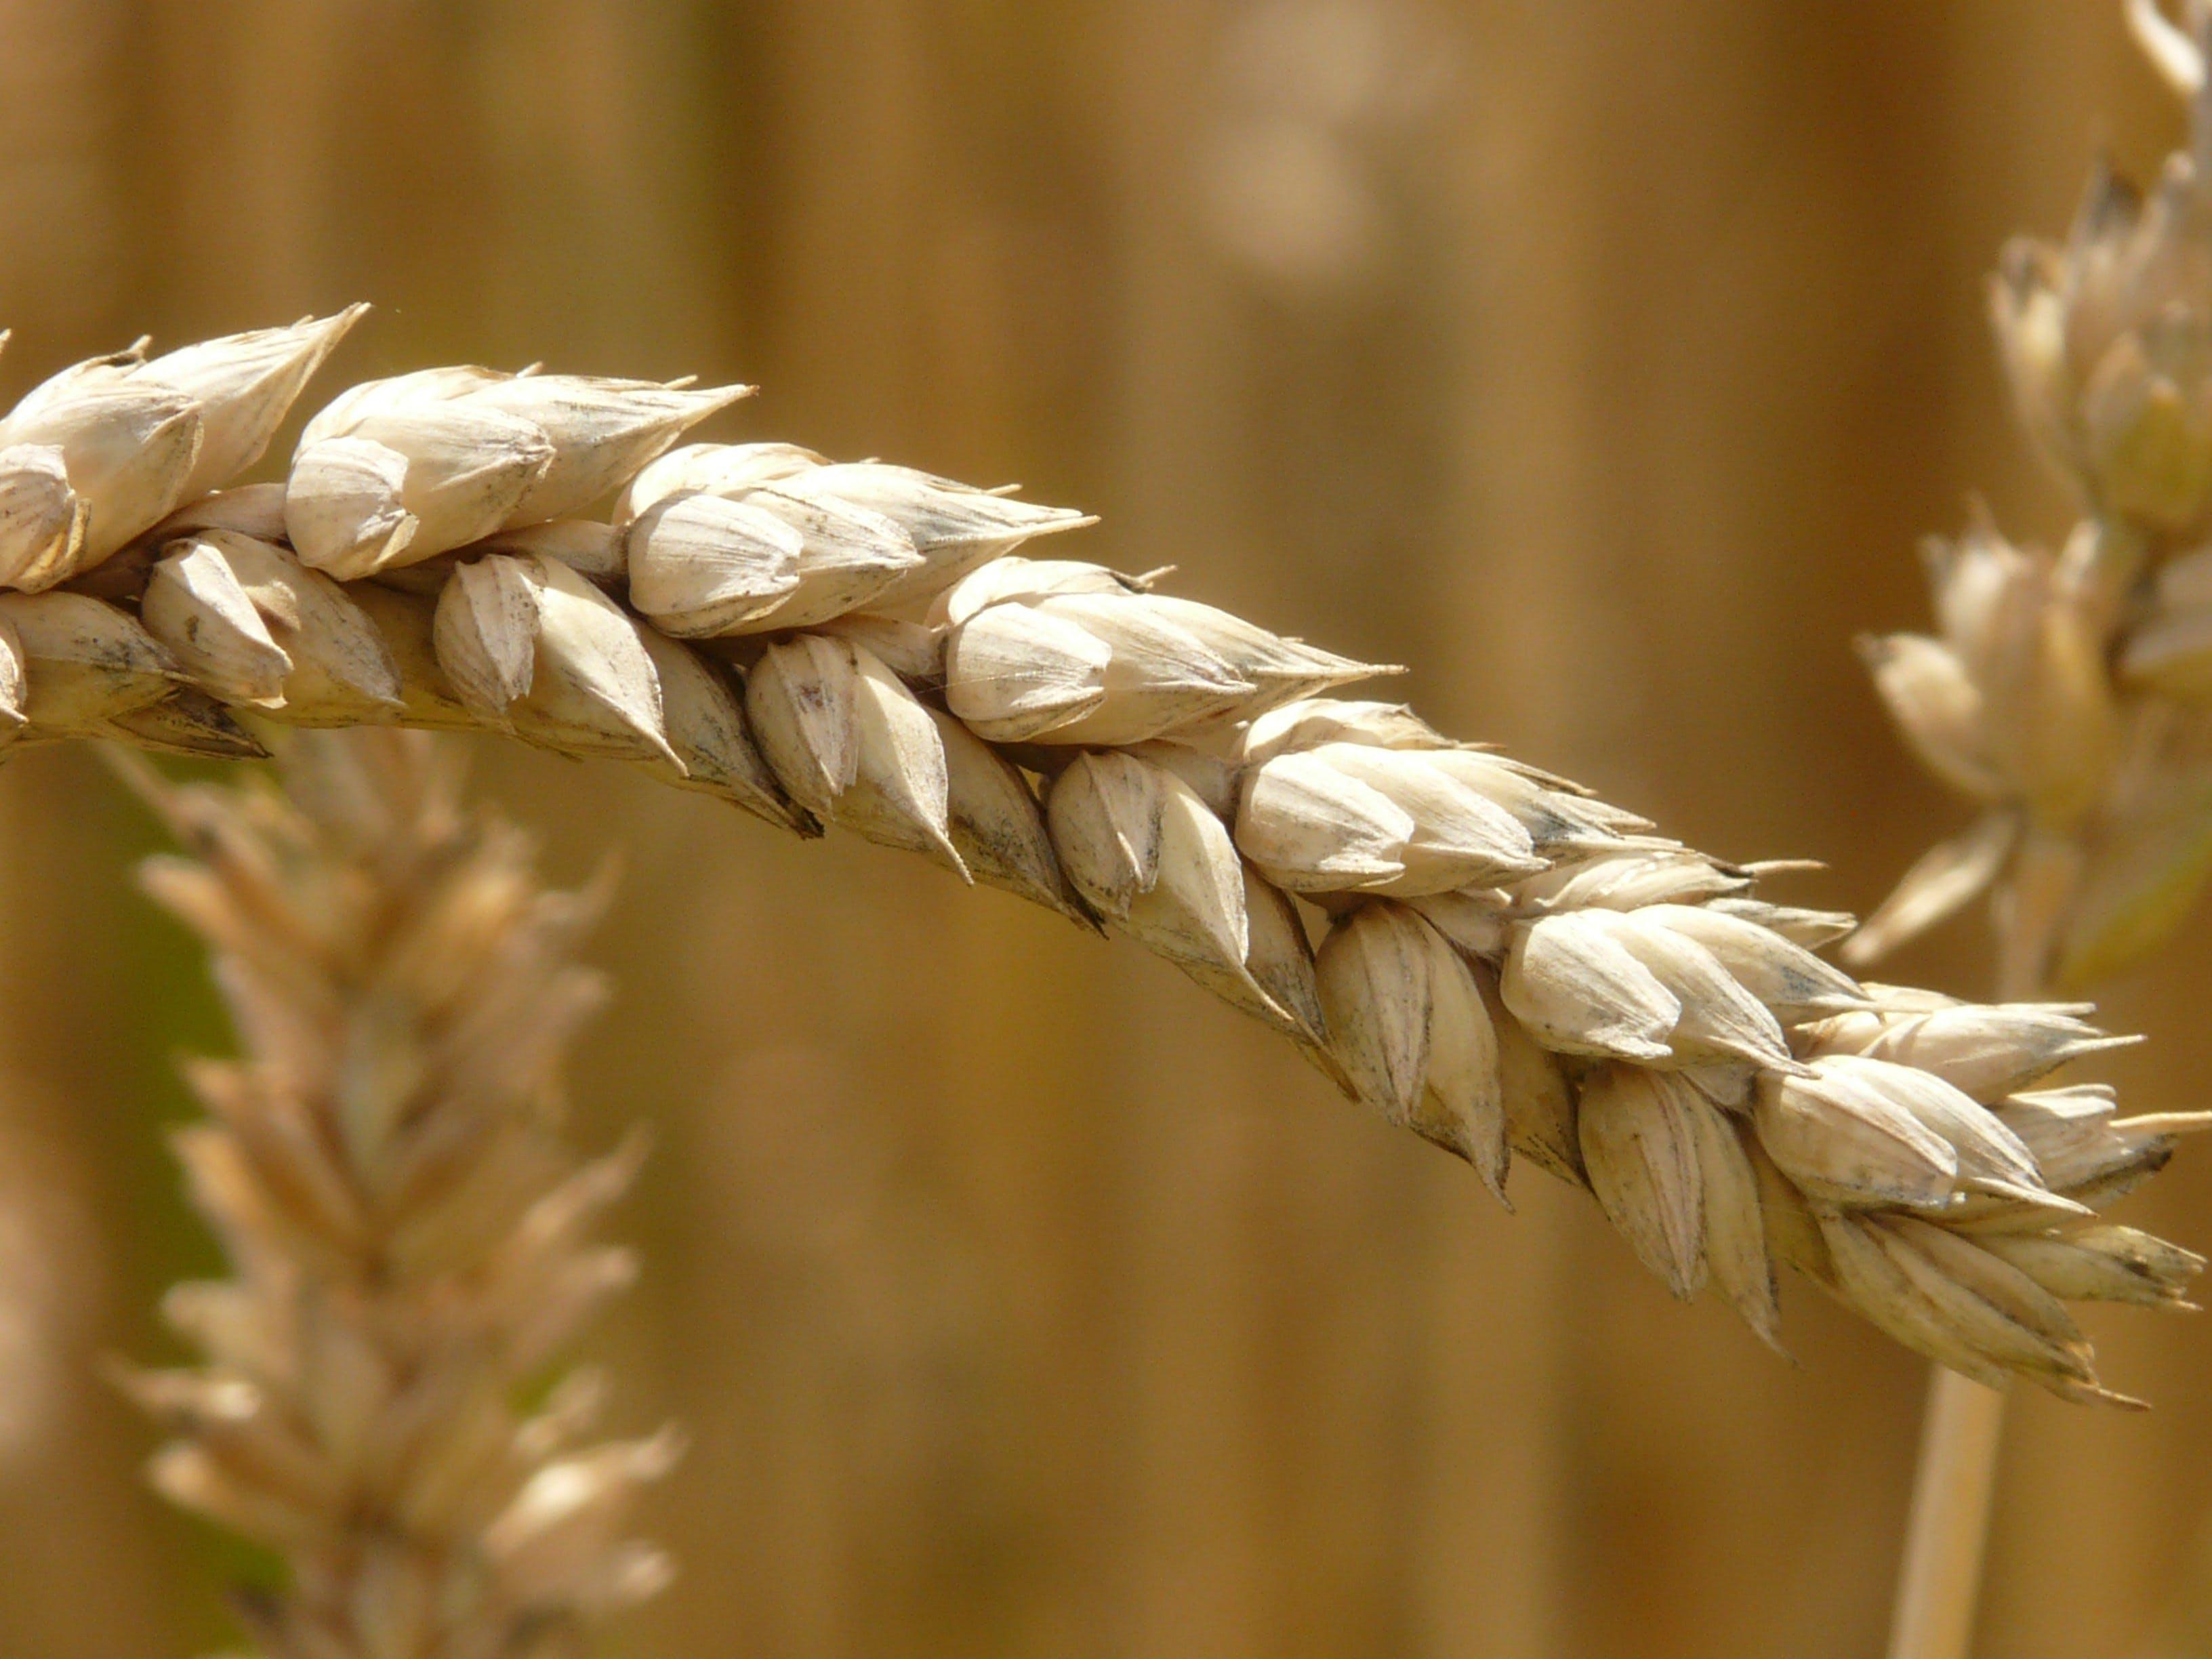 Selective Focus Photography of Brown Barley